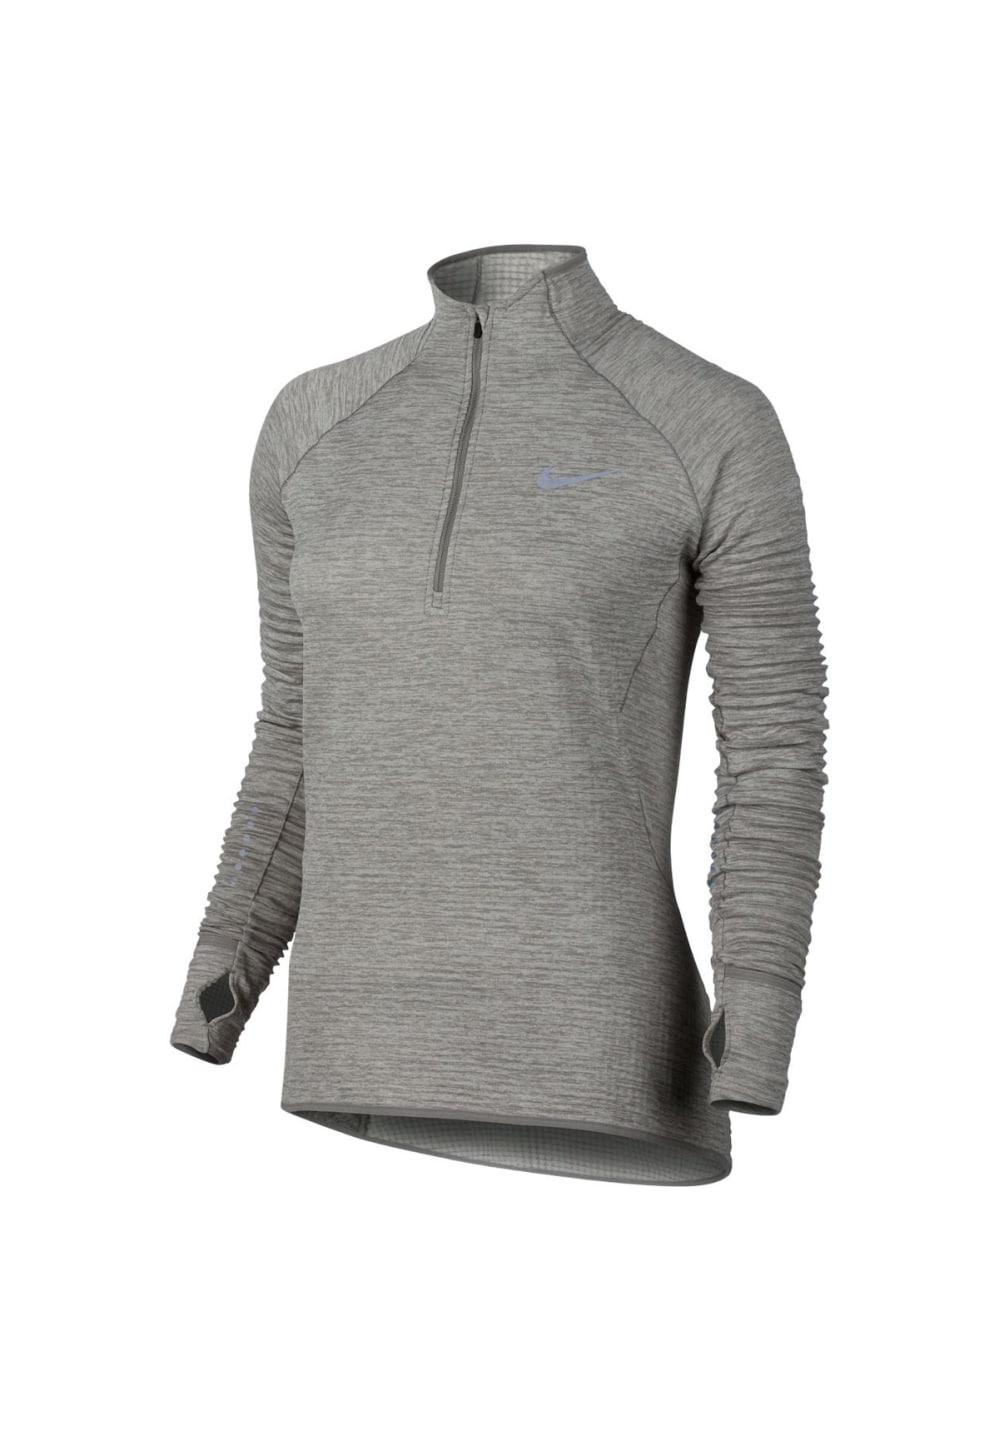 Nike Element Sphere Longsleeve Half Zip - Laufshirts für Damen - Grau, Gr. L